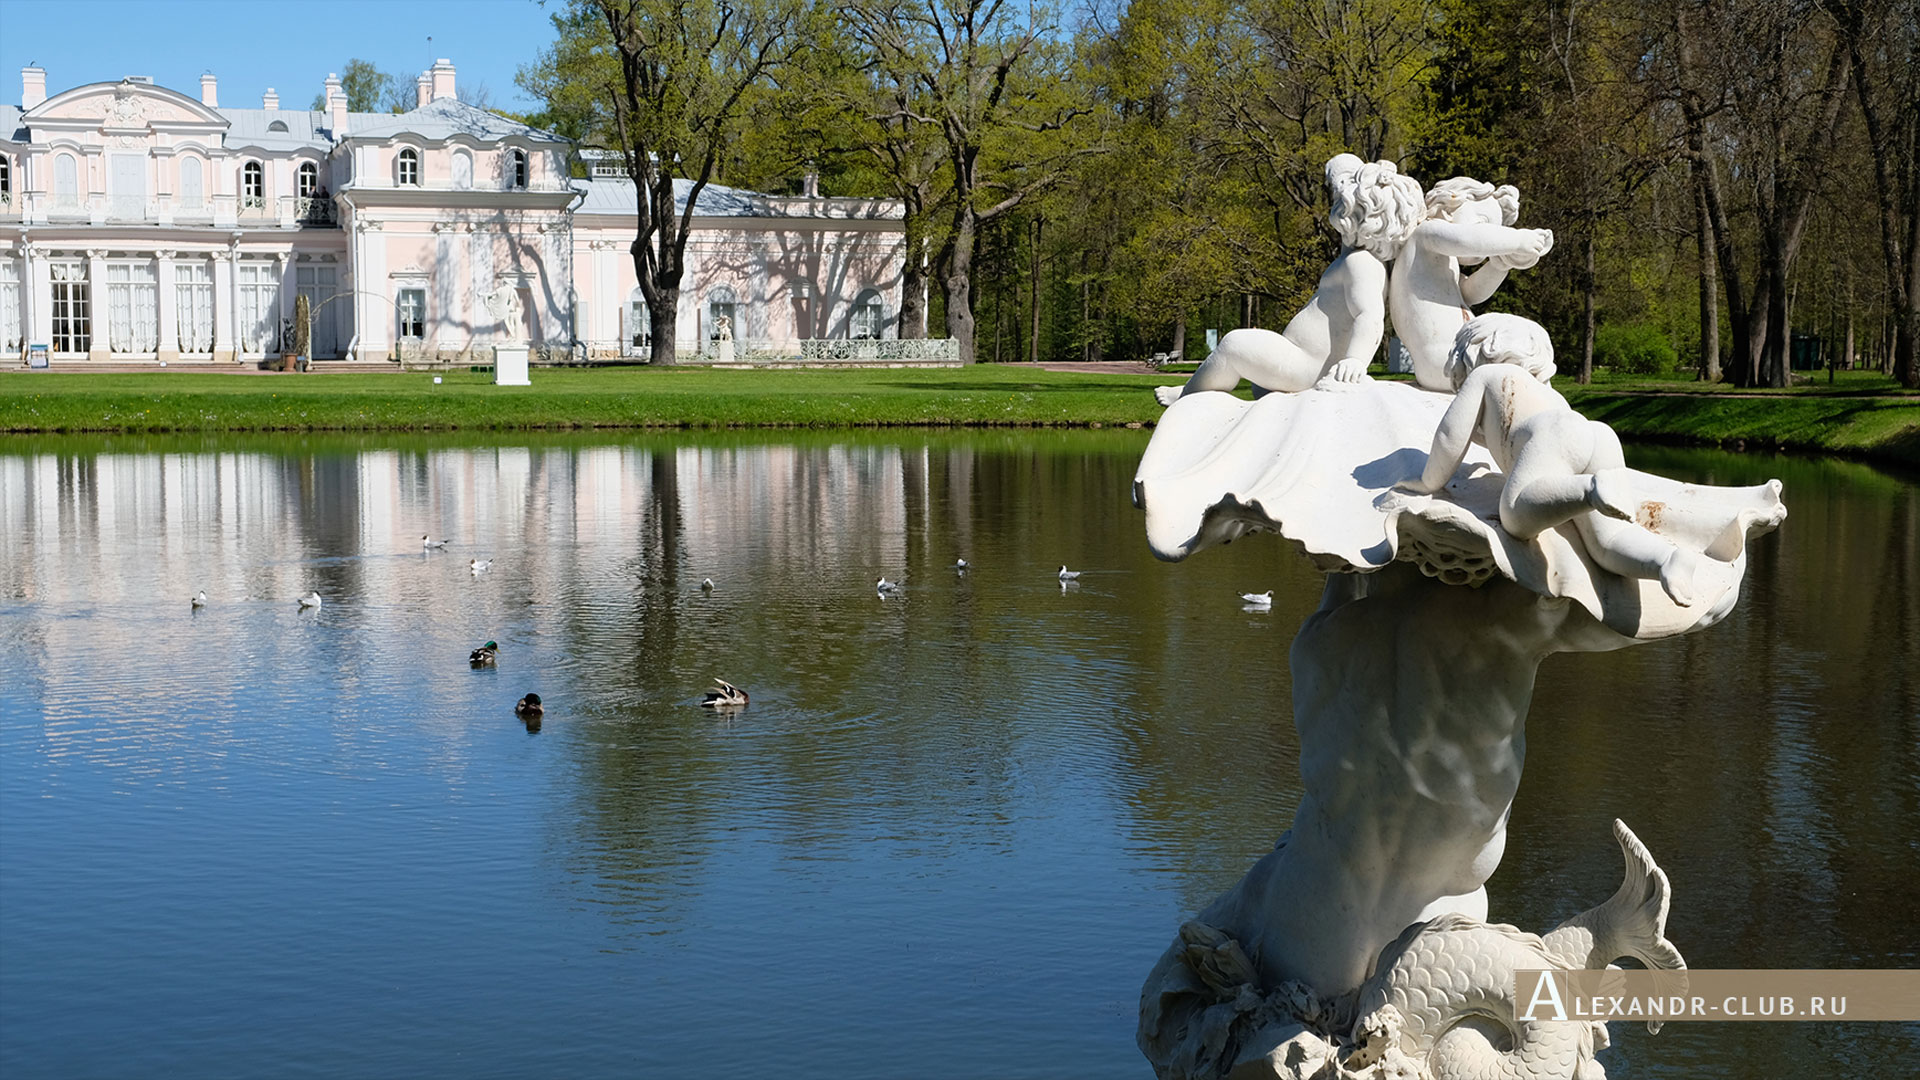 Ораниенбаум, весна, Китайский пруд, Китайский дворец